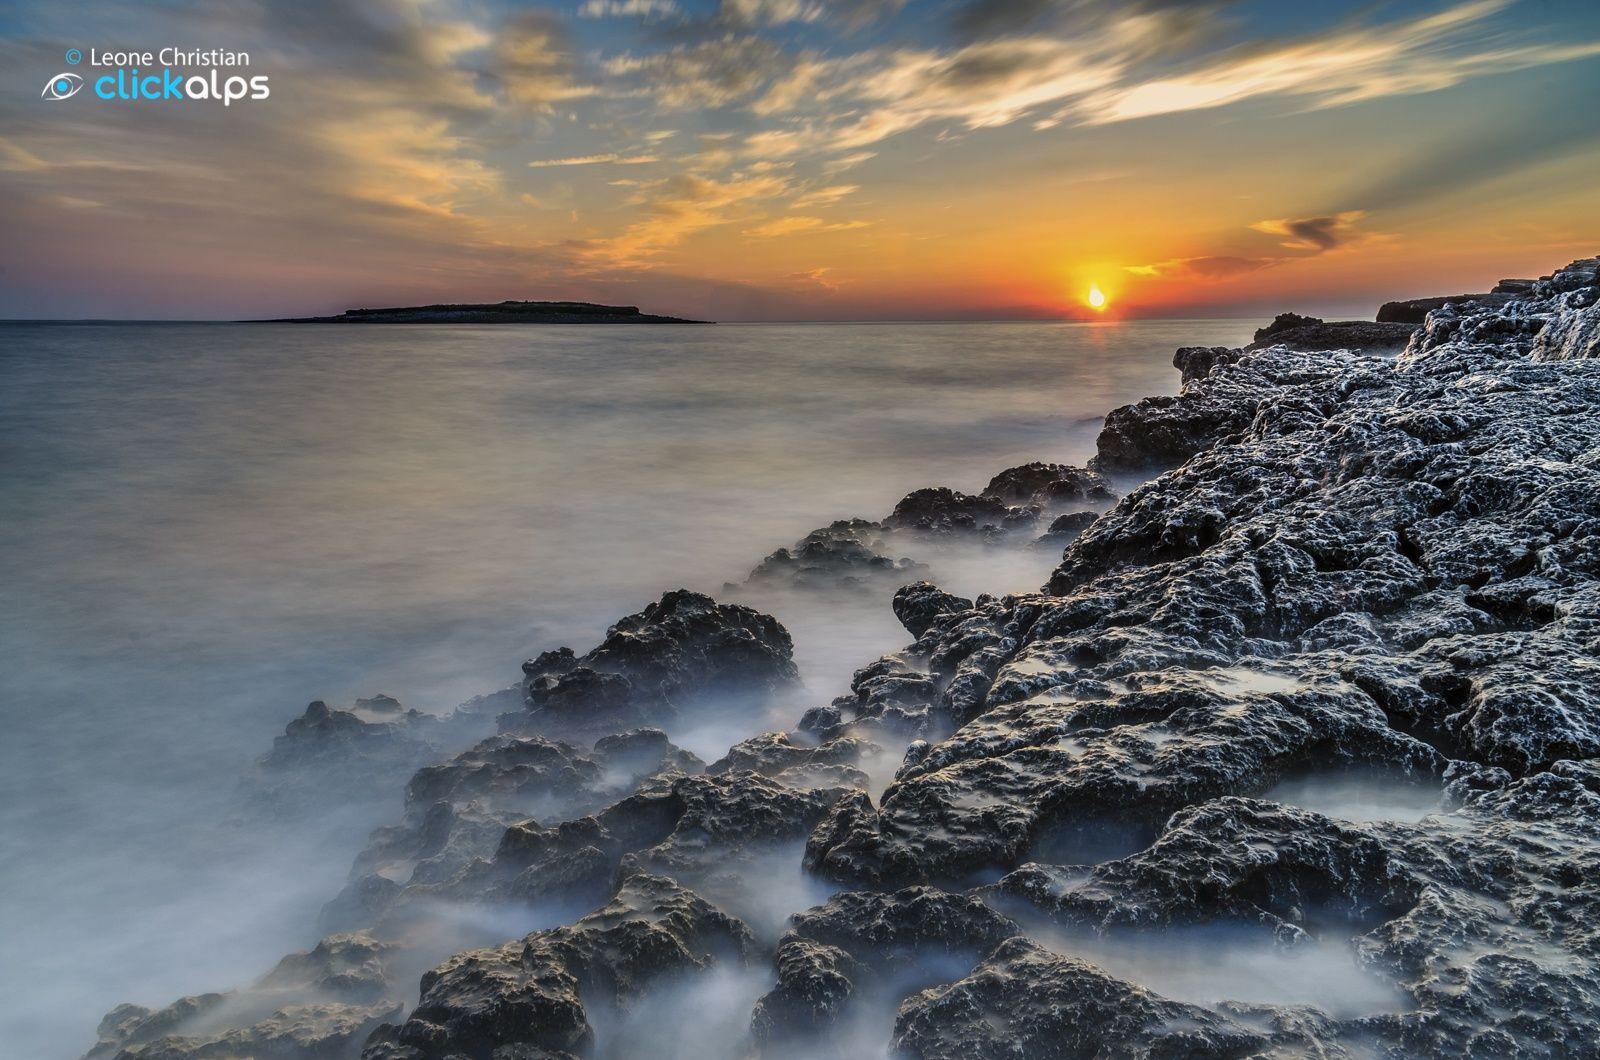 The rugged coastline of Croatia - Premantura by Leone Christian on 500px